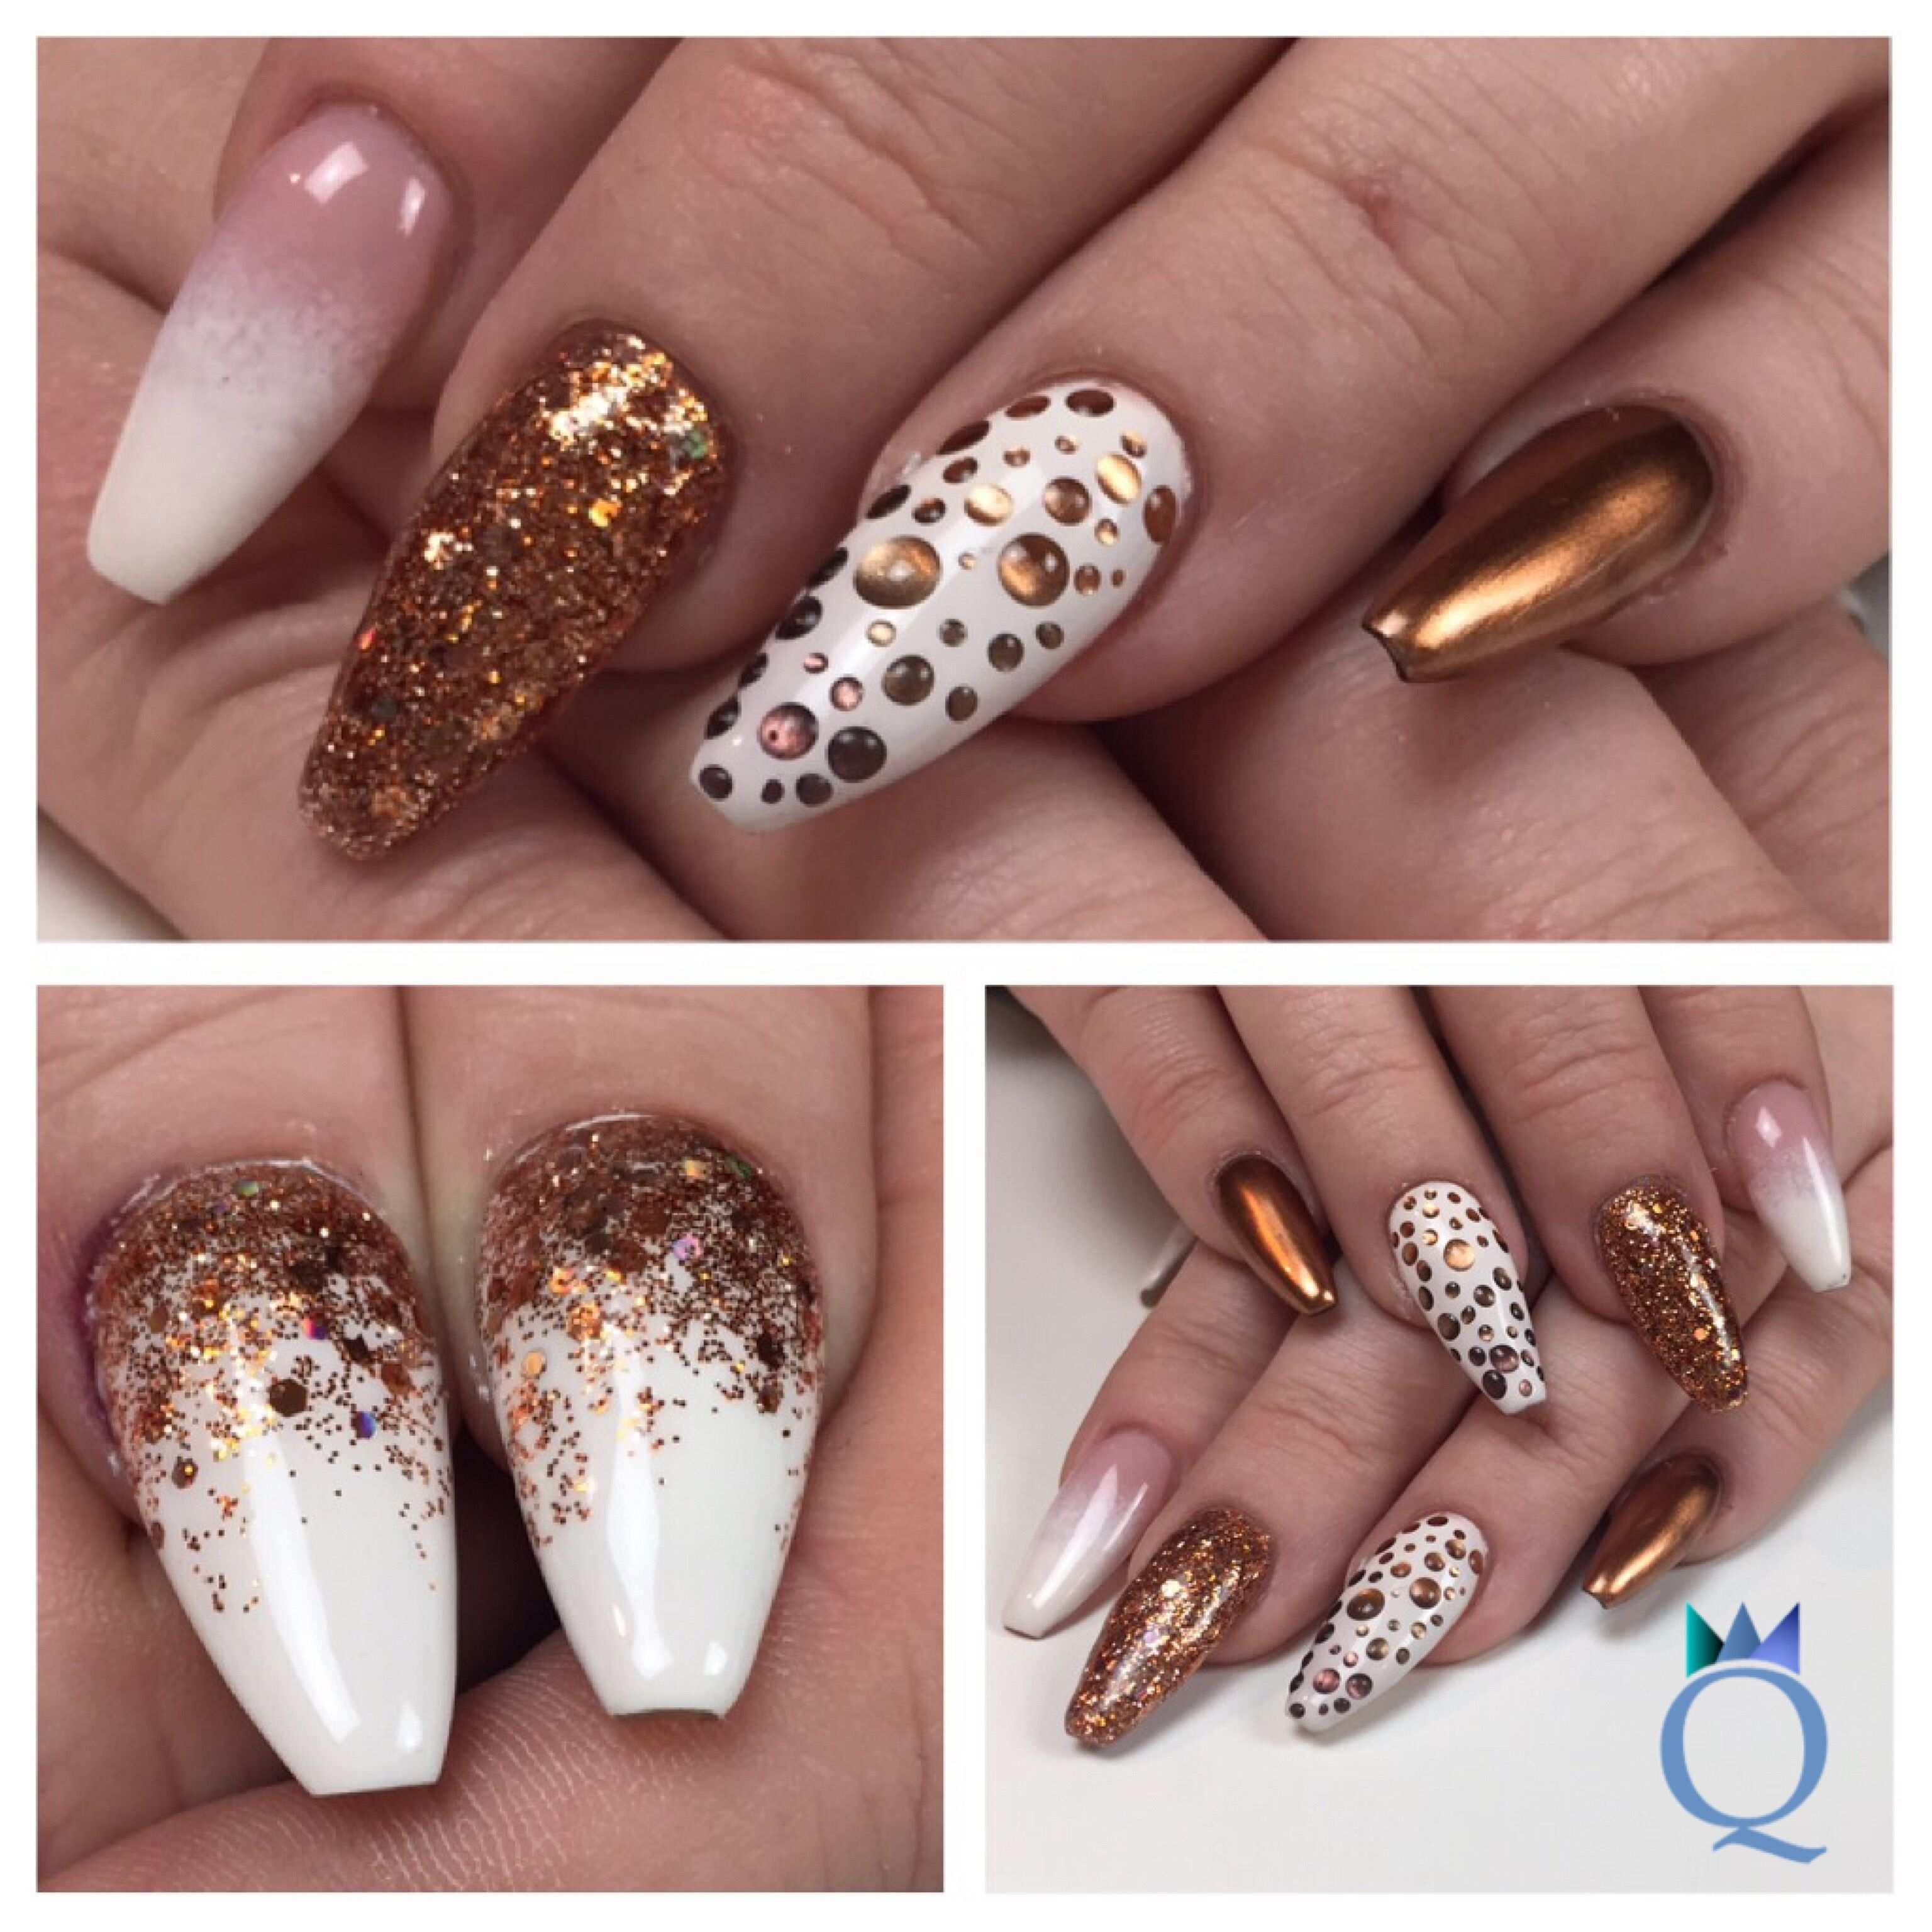 Coffinshape Ballerinanails Longnails Gelnails Nails White Copper Metallic Dots Ballerina Form Langenagel Ge Gel Nails French White Nails Gel Nails